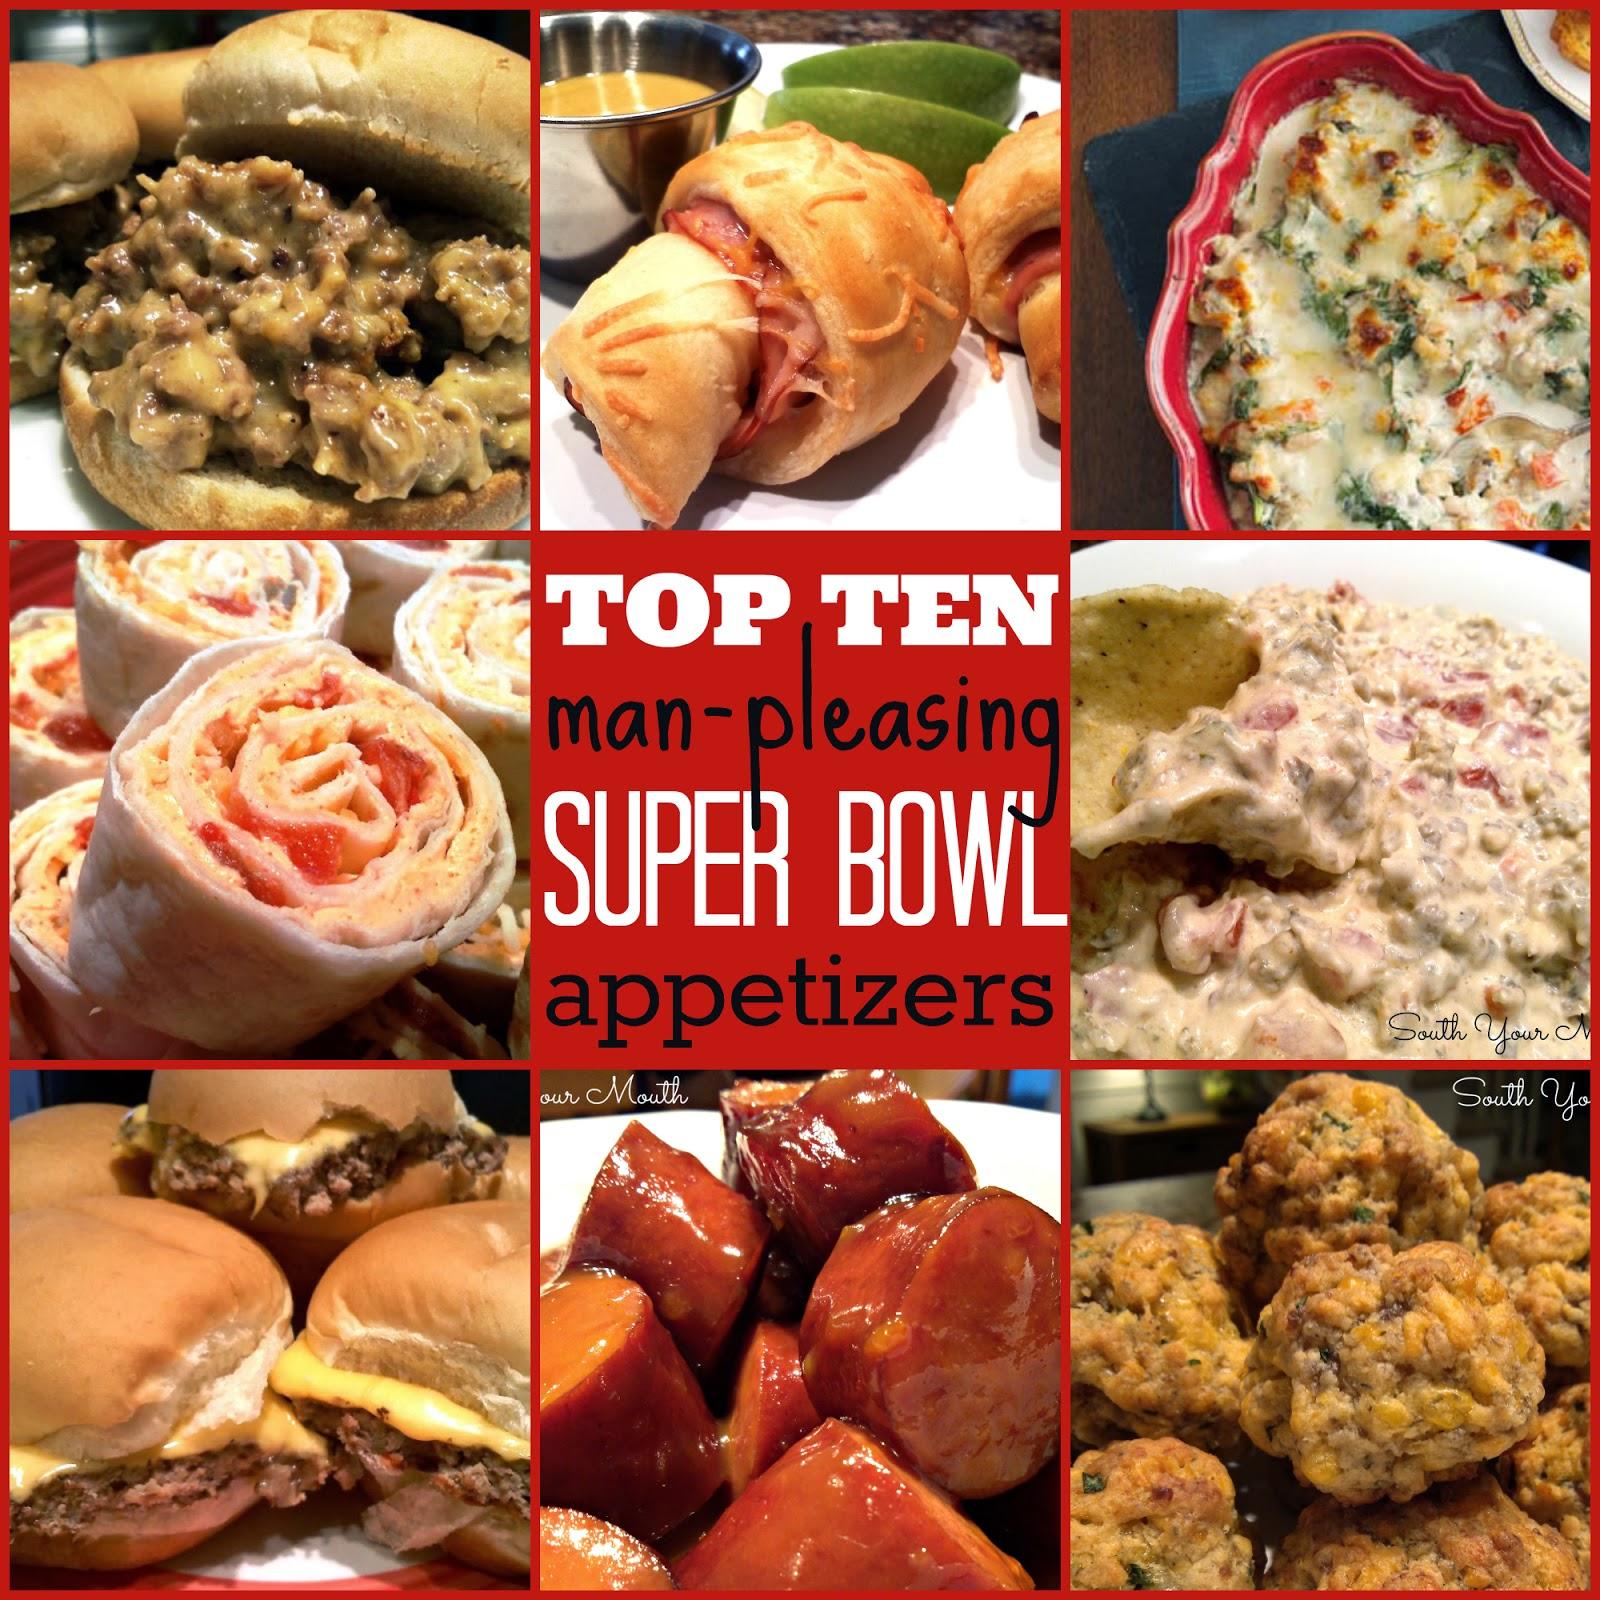 Man Pleasing Super Bowl Etizers This List Chocked Full Of Ings Like Burgers And Kielbasa Ground Beef Cheese